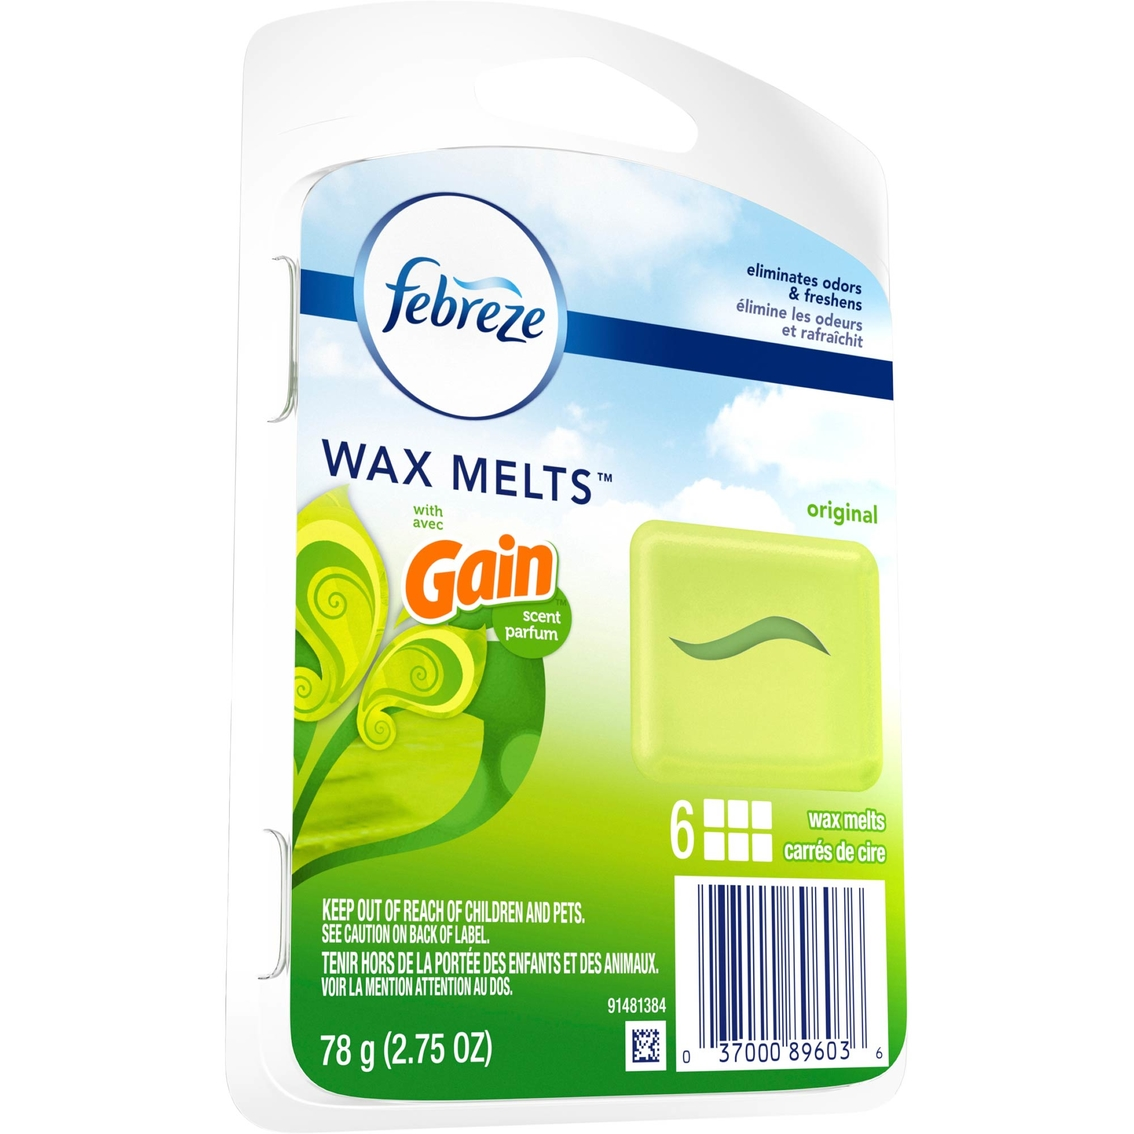 Febreze Wax Melts Air Freshener With Gain Original Air Fresheners Household Shop The Exchange